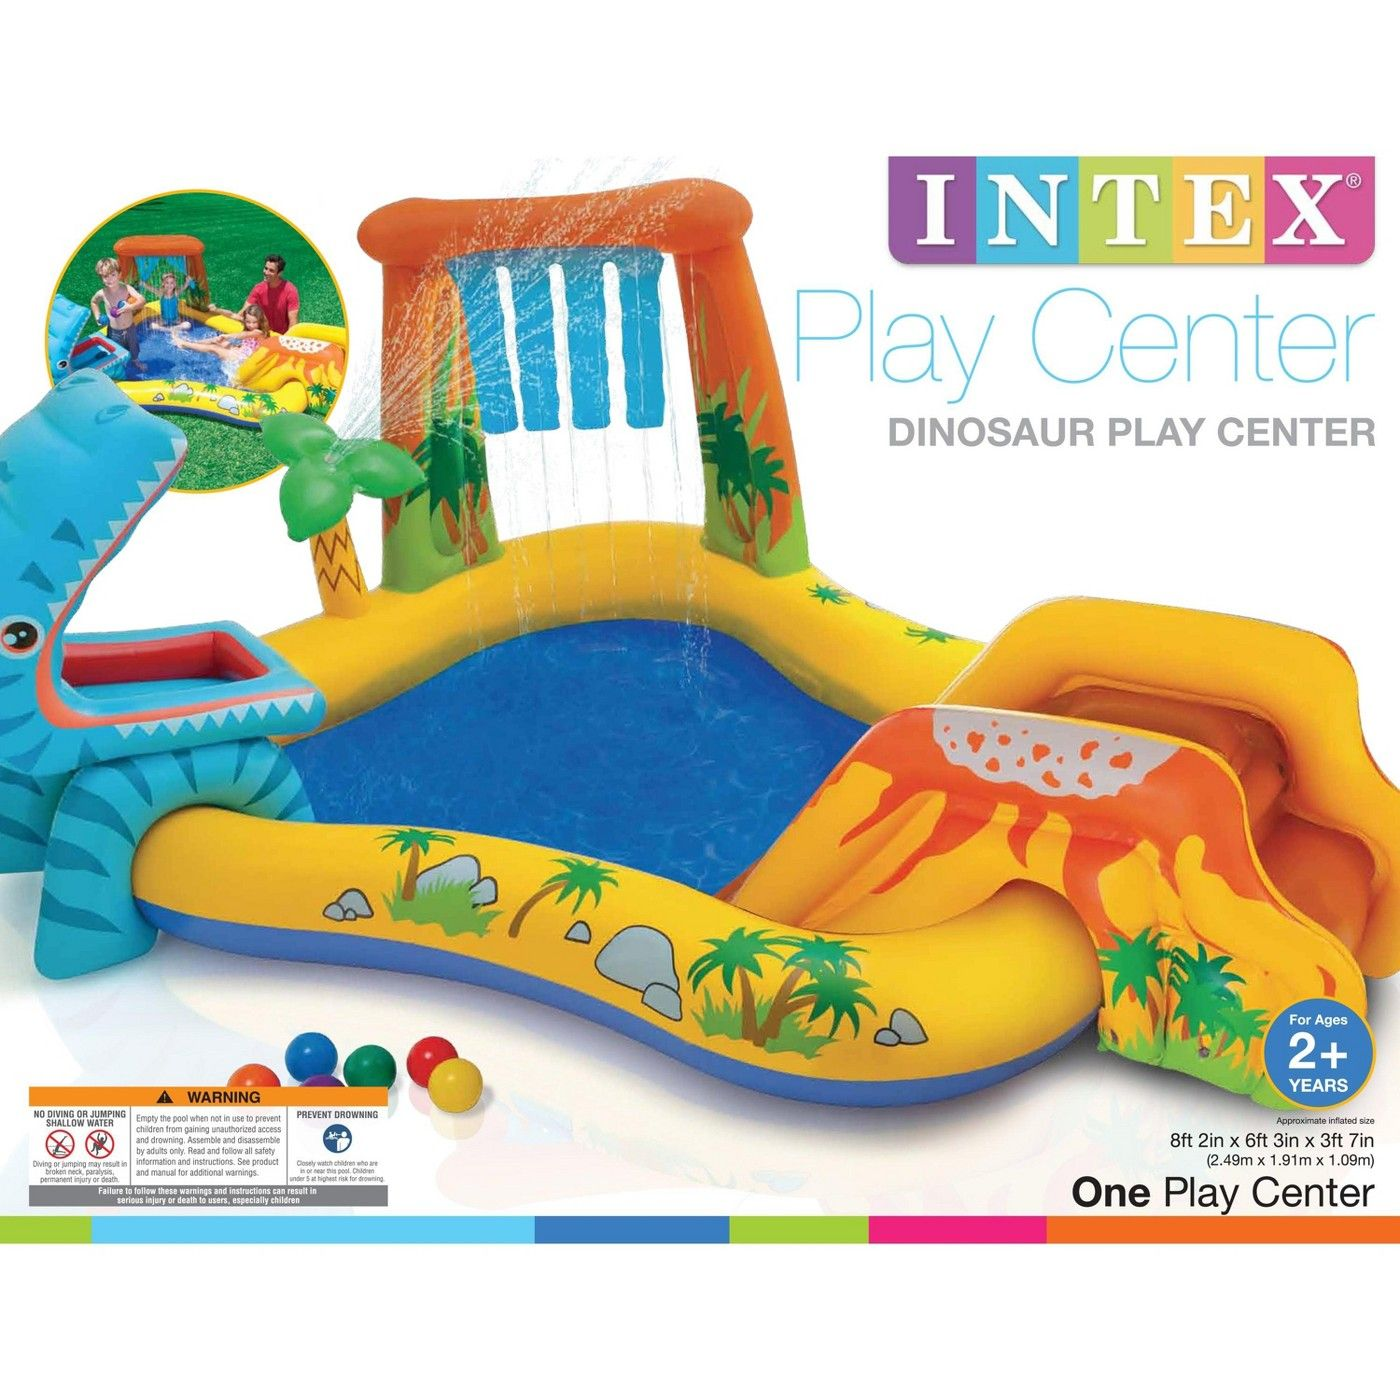 Intex Dinosaur Play Center Kiddie Pool Inflatable Rainbow Ring Water Play Image 5 Of 6 Dinosaur Play Kids Play Centre Play Centre